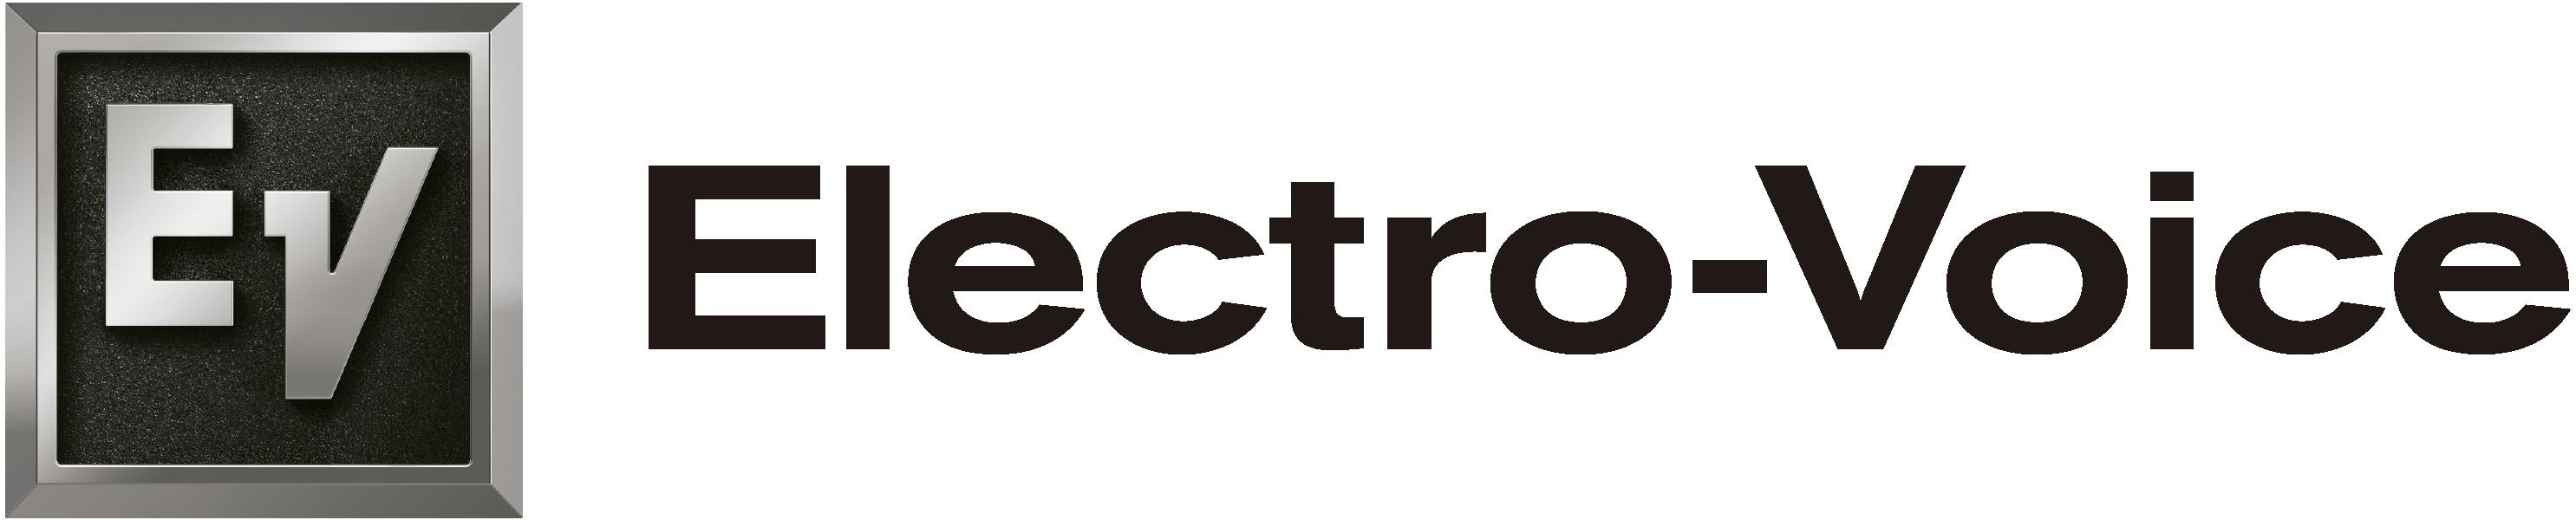 electro voice logovtext86